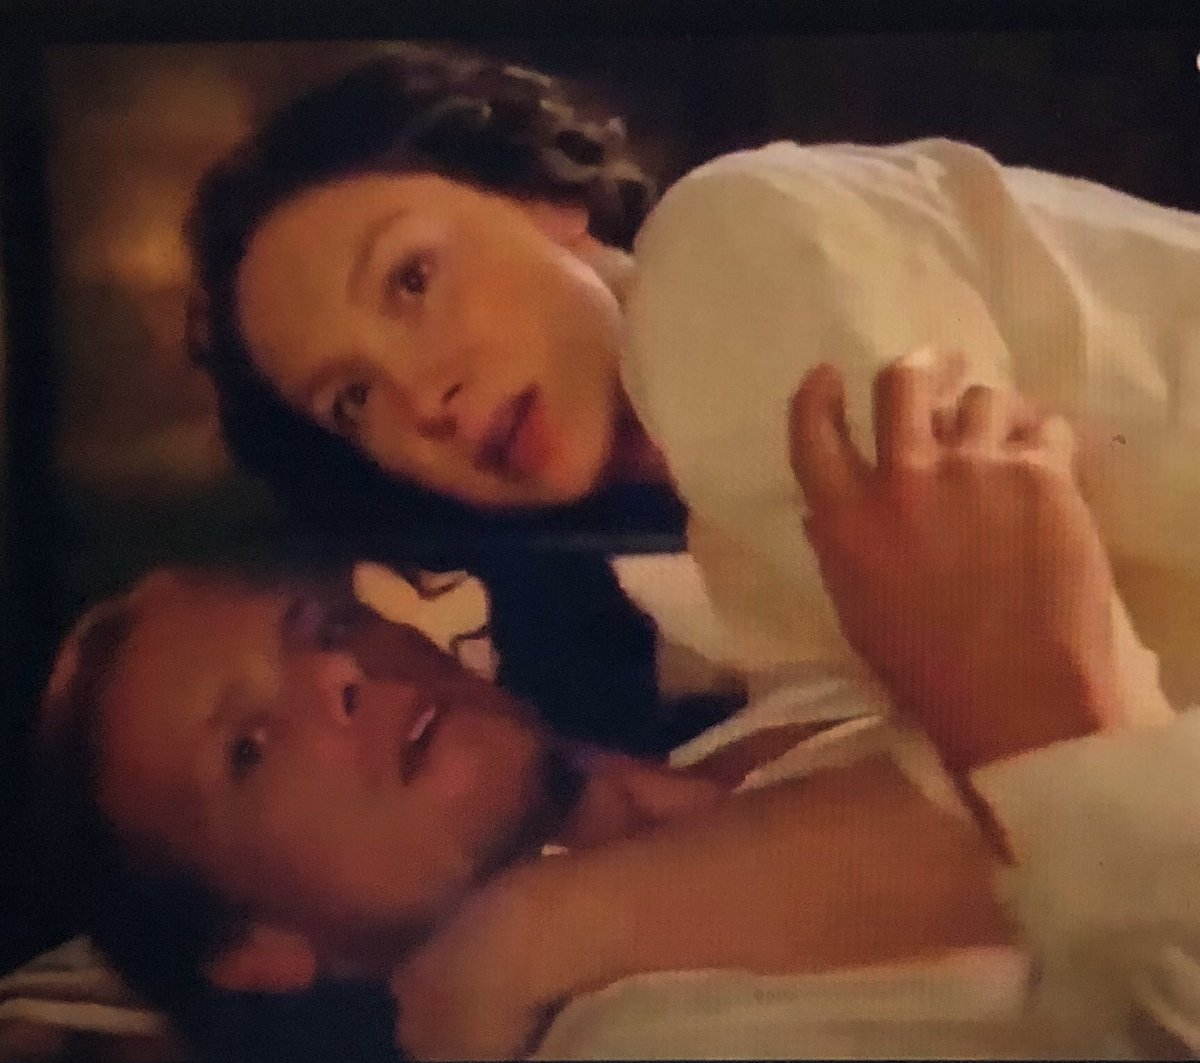 @pellicott1 And then it happened AGAIN! 🤣🤣🤣#Kissusinteruptus  #TheFrasers #Outlander #OutlanderSeason5Premiere